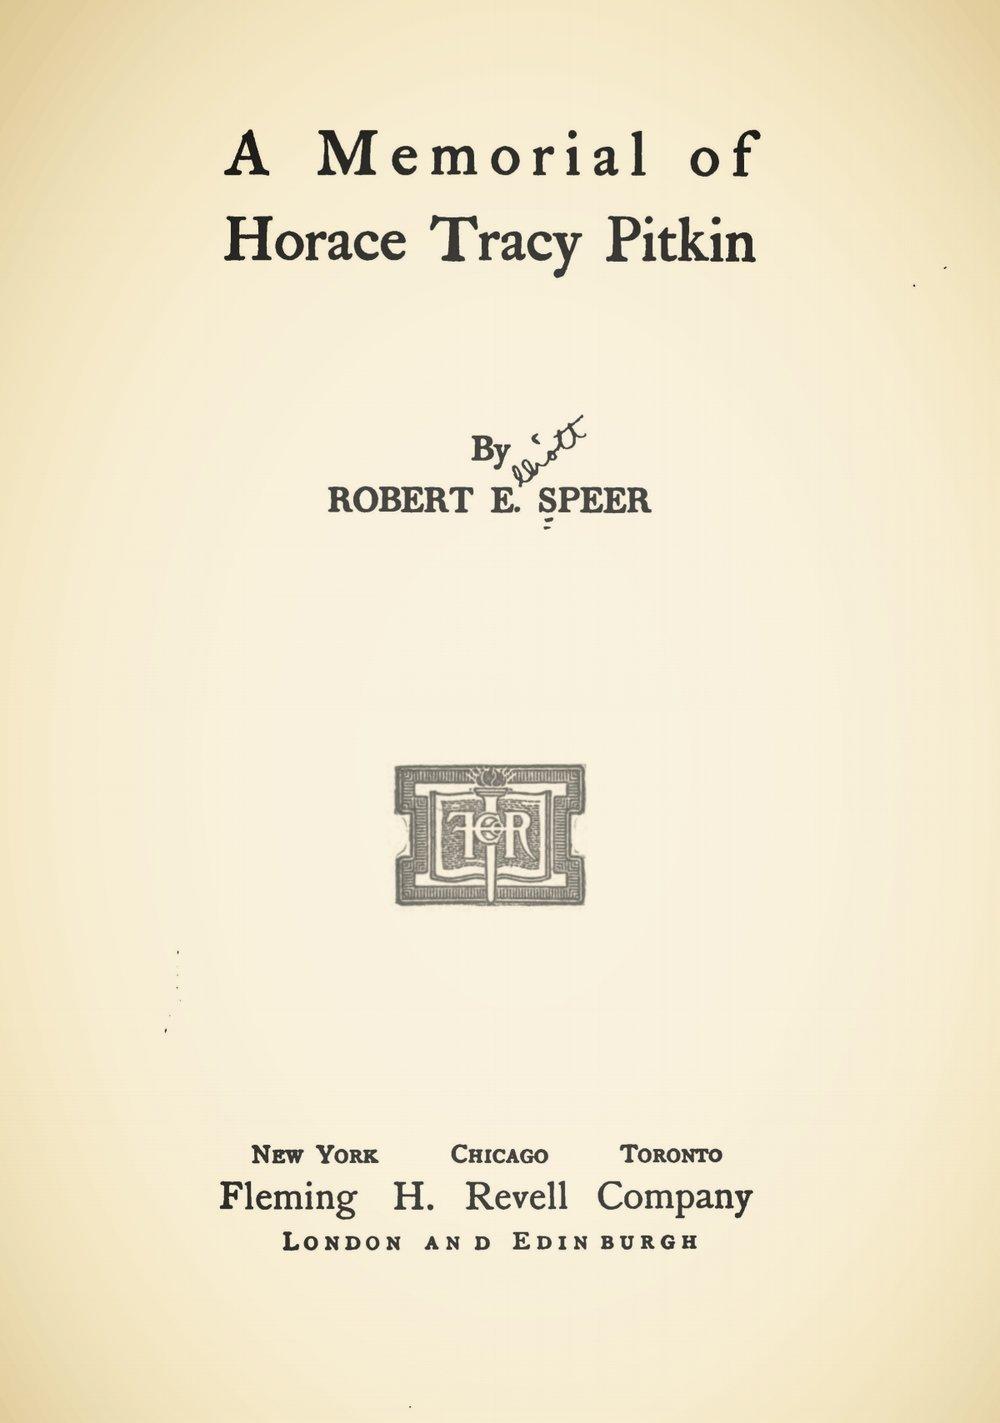 Speer, Robert Elliott, A Memorial of Horace Tracy Pitkin Title Page.jpg